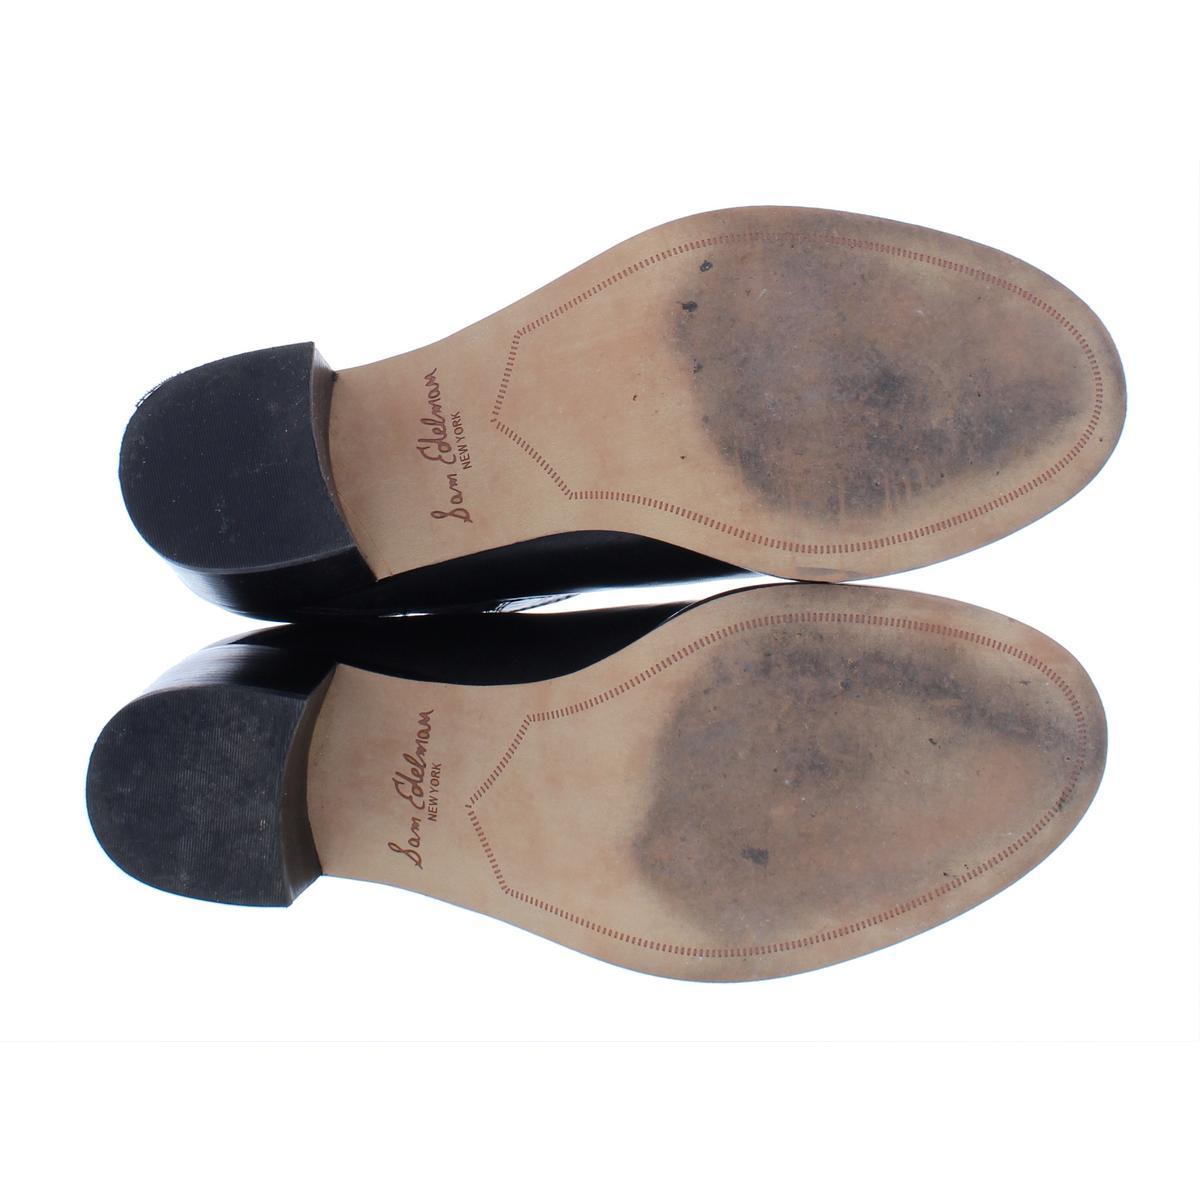 454891483516 Sam Edelman Womens Jodie Black Chelsea Boots Shoes 6.5 Medium (B